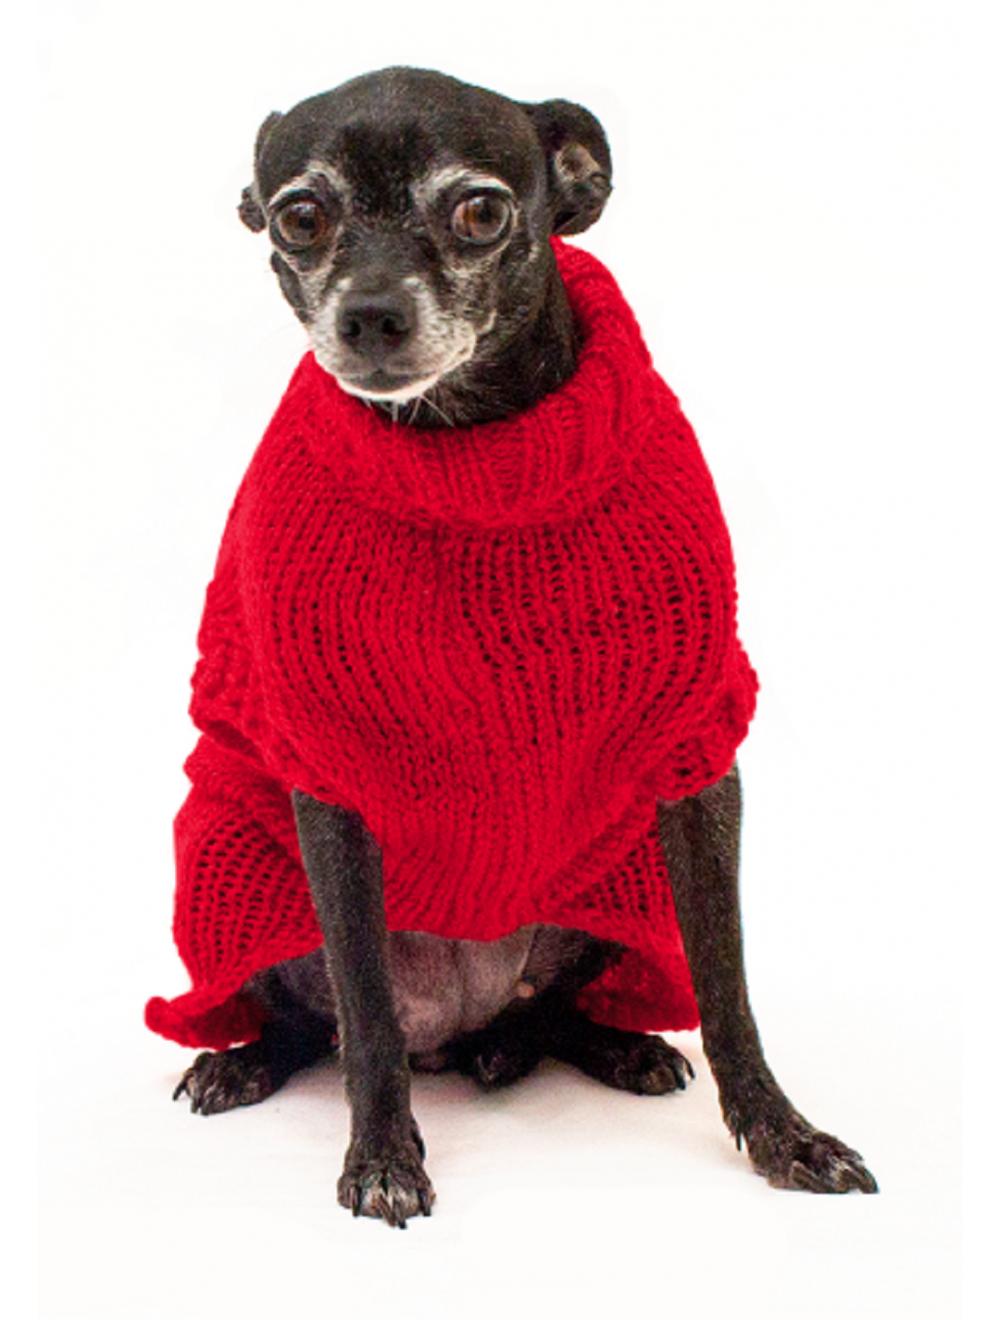 Saco Libby para Perros Rojo Talla XL - Ciudaddemascotas.com